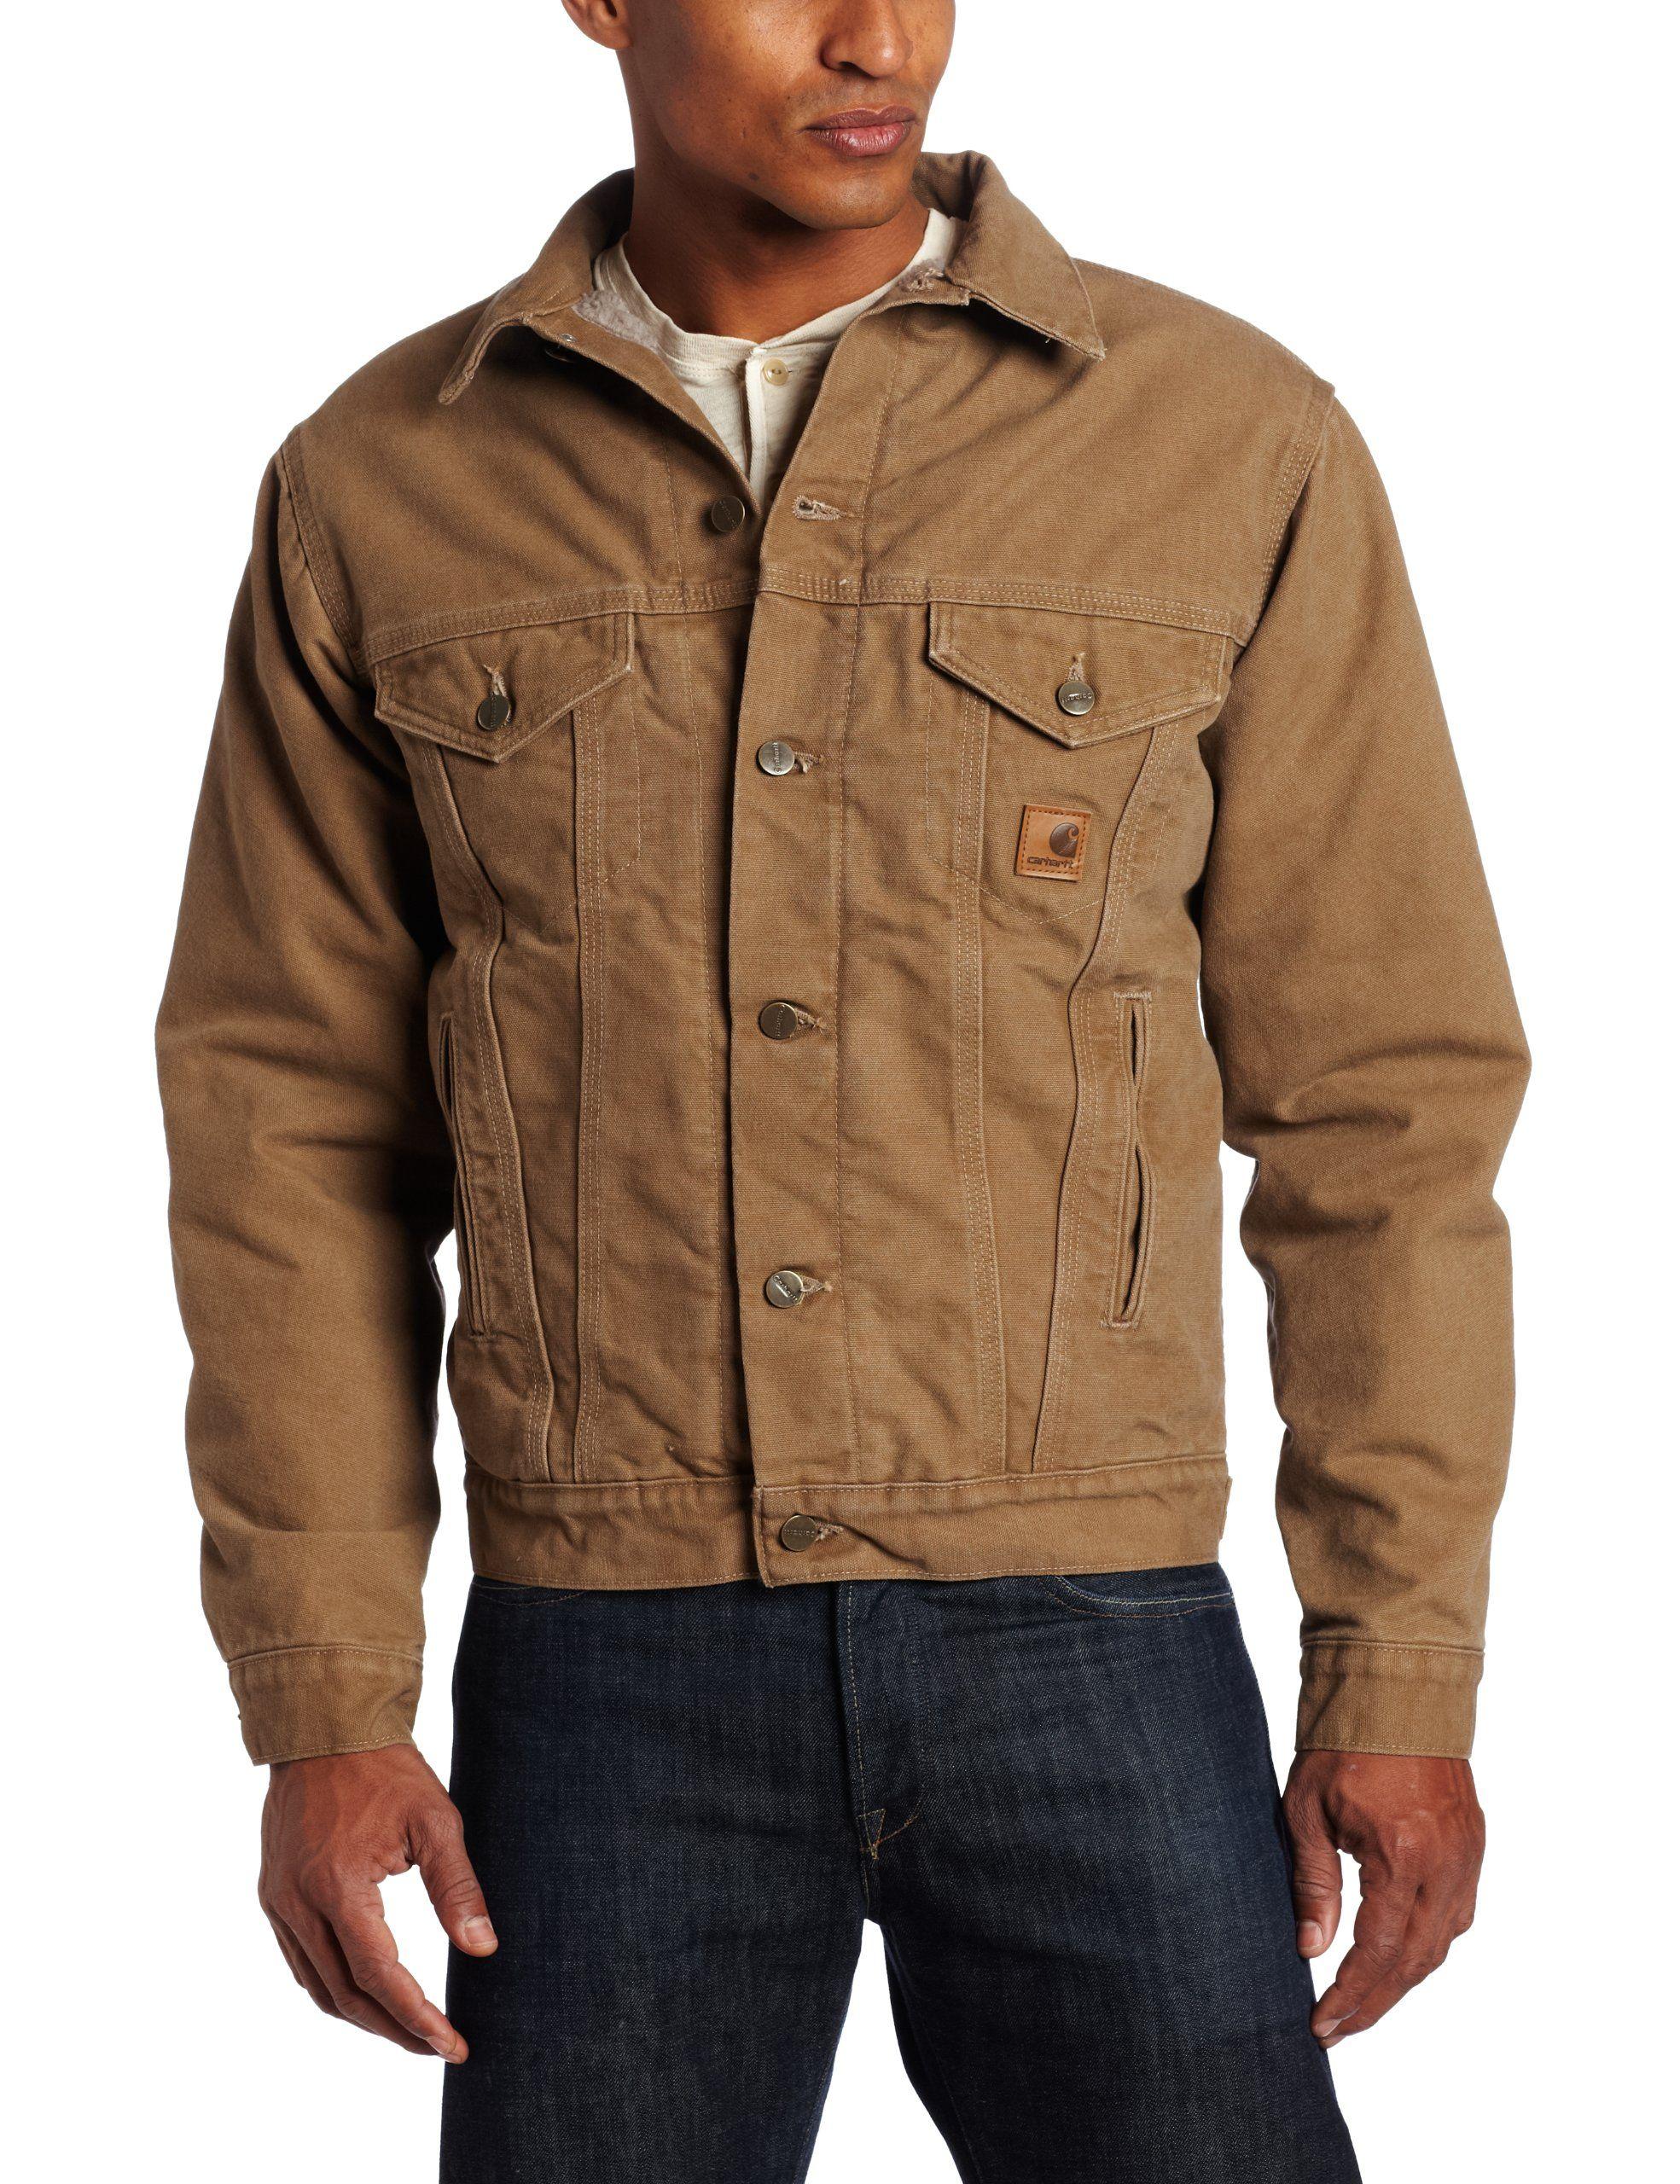 Carhartt Men S Sandstone Jean Jacket At Amazon Men S Clothing Store Denim Jackets Jacken Jeansjacke Manner Schuhe [ jpg ]